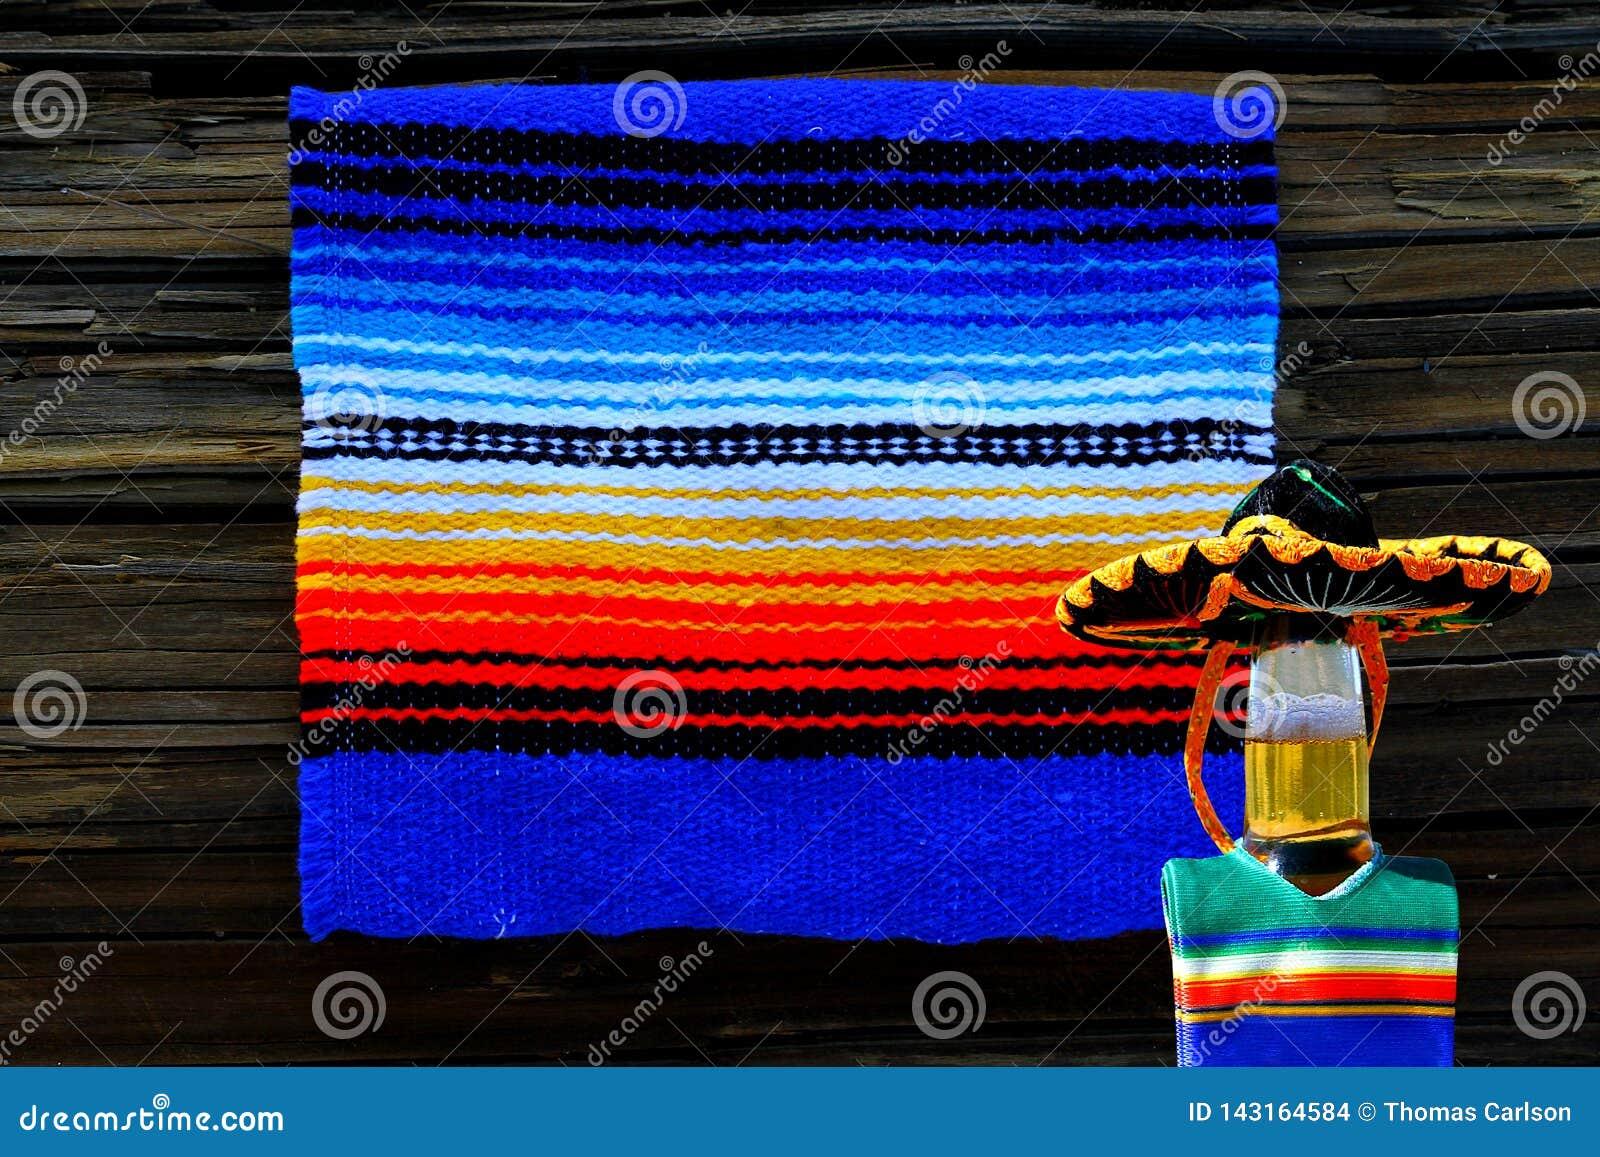 Cinco de马约角墨西哥毯子和啤酒瓶阔边帽